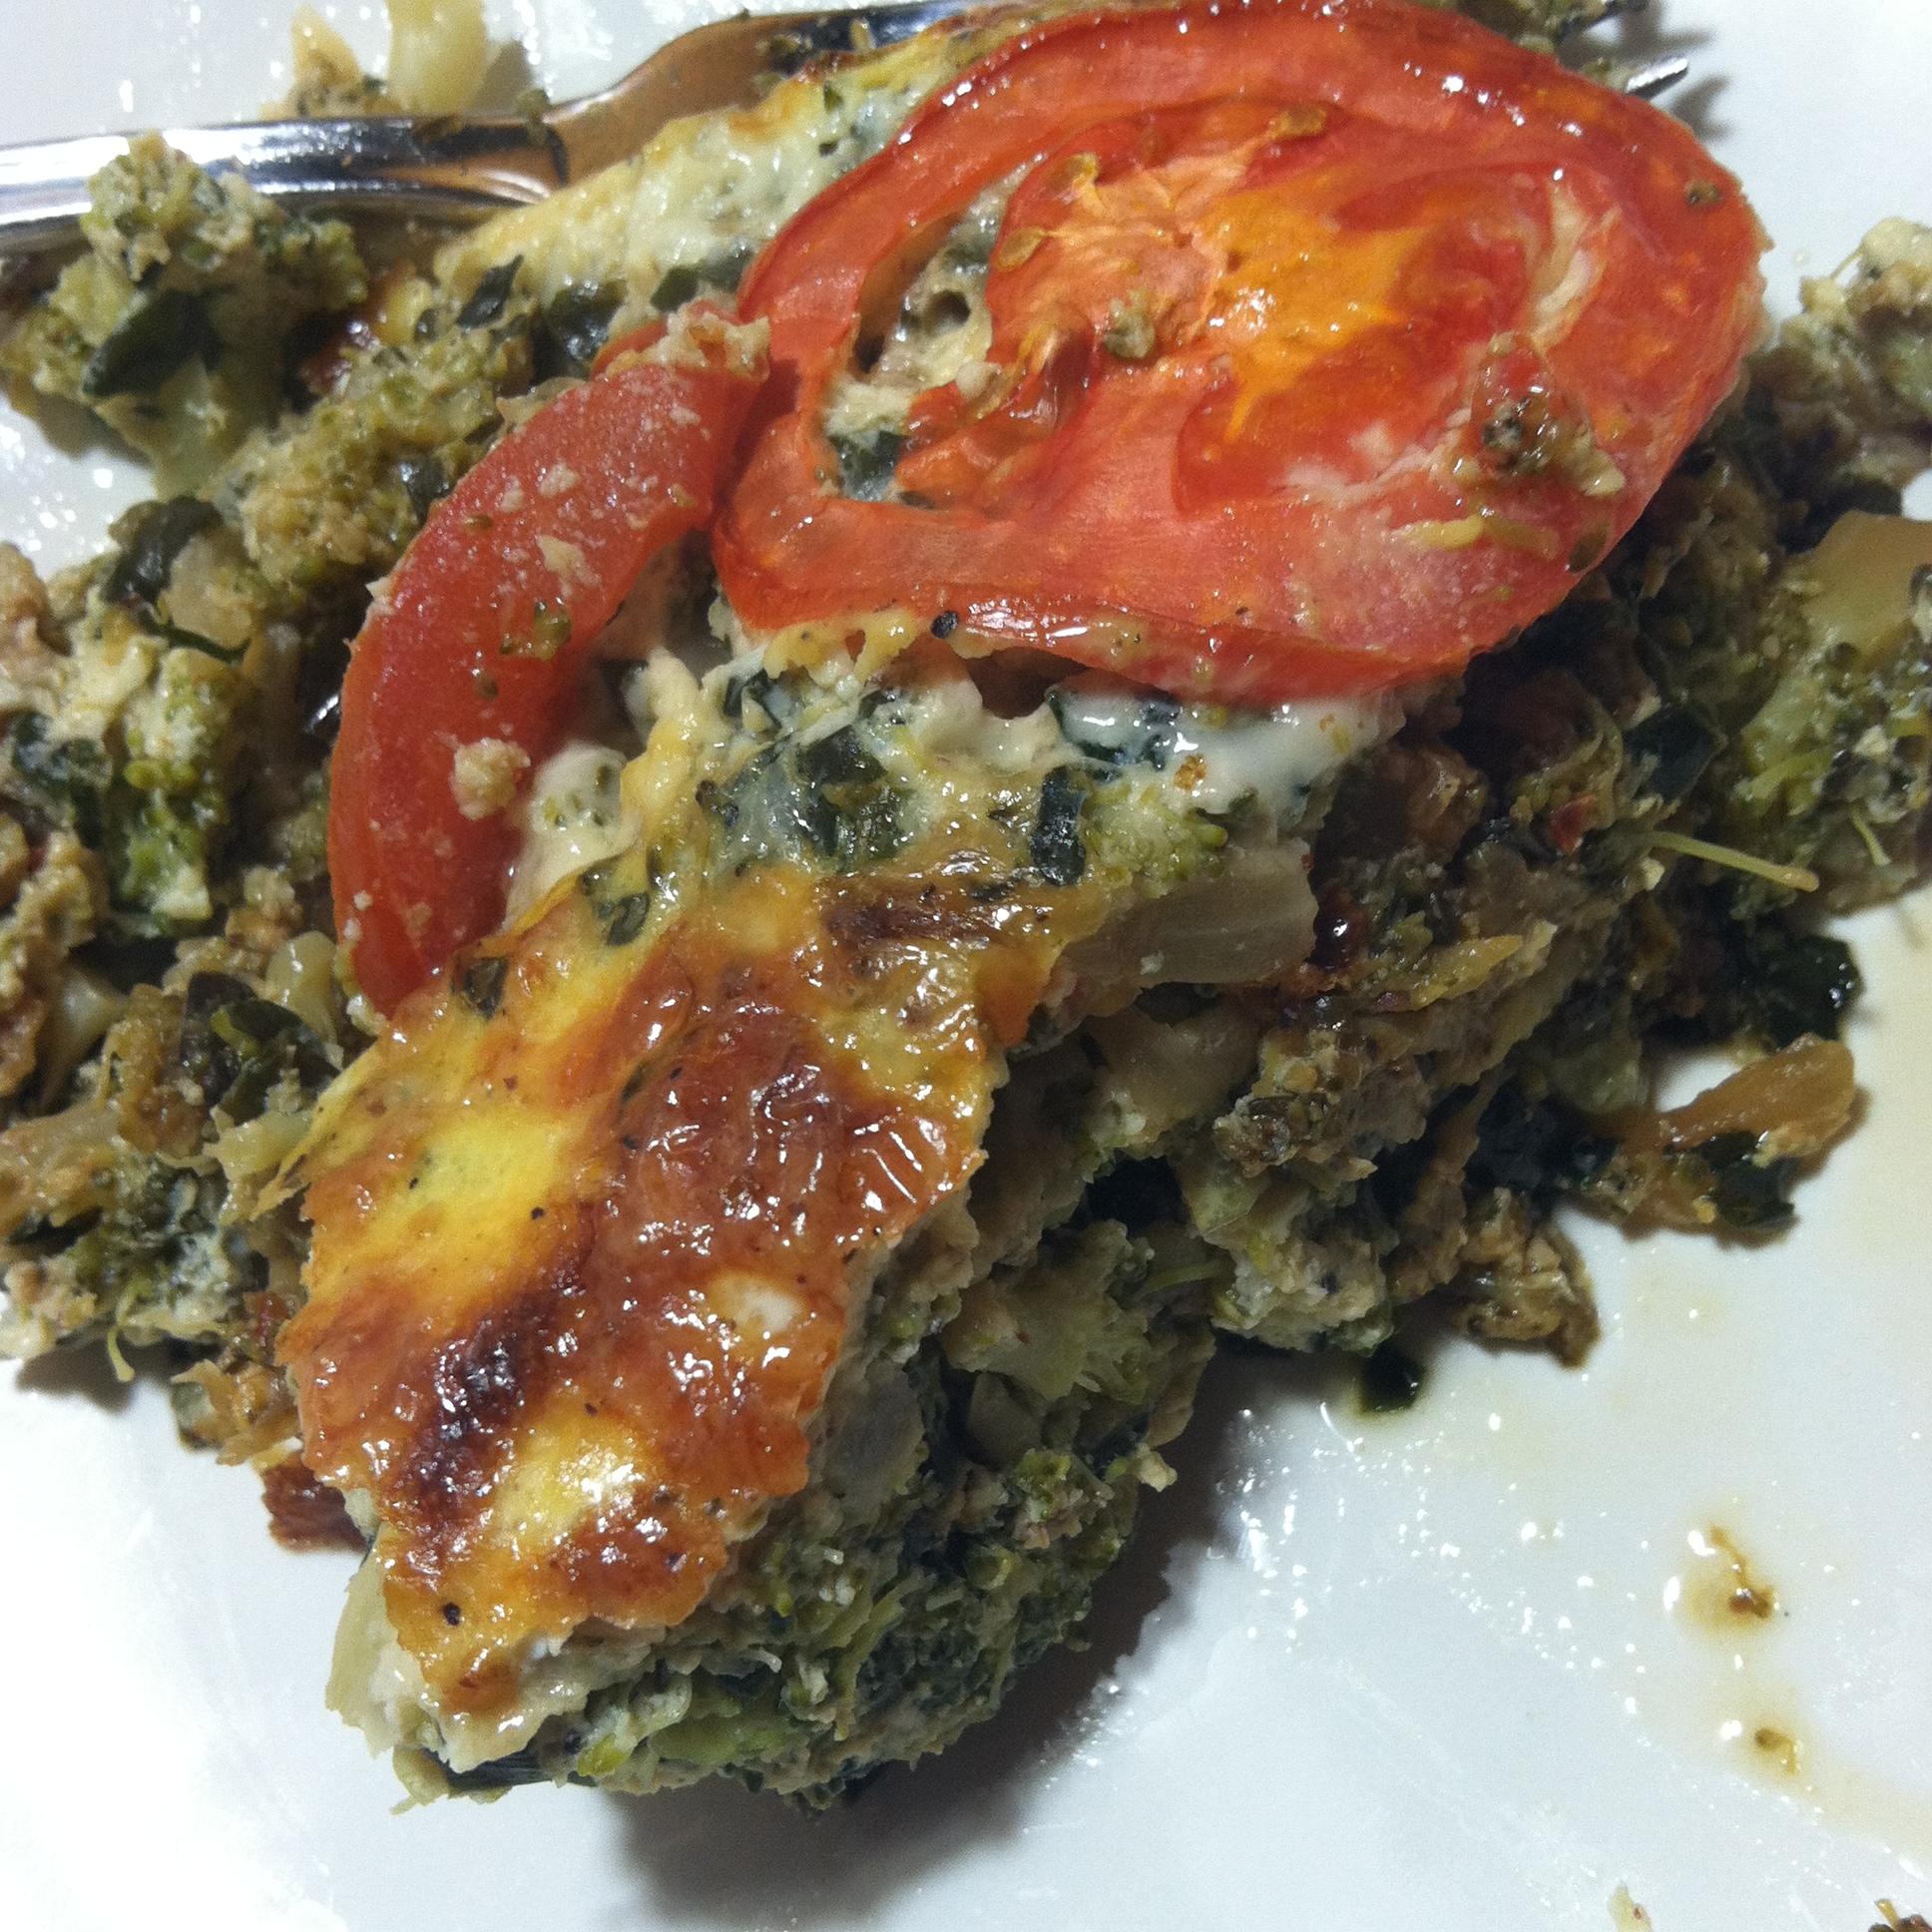 Garden Vegetable Crustless Quiche: Healthy And Easy Crustless Summer Vegetable Quiche